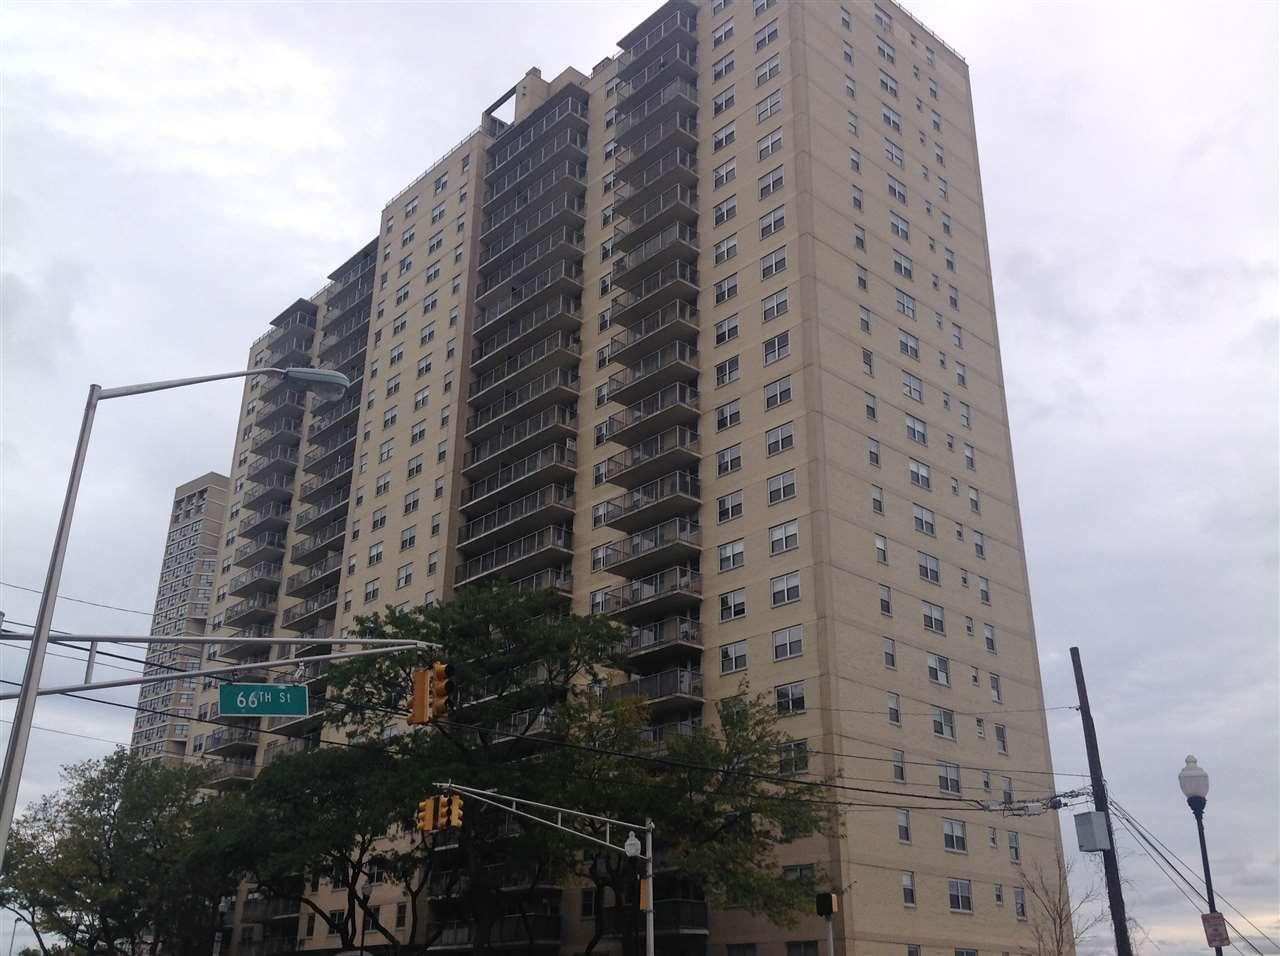 6600 BLVD EAST 21K, West New York, NJ 07093